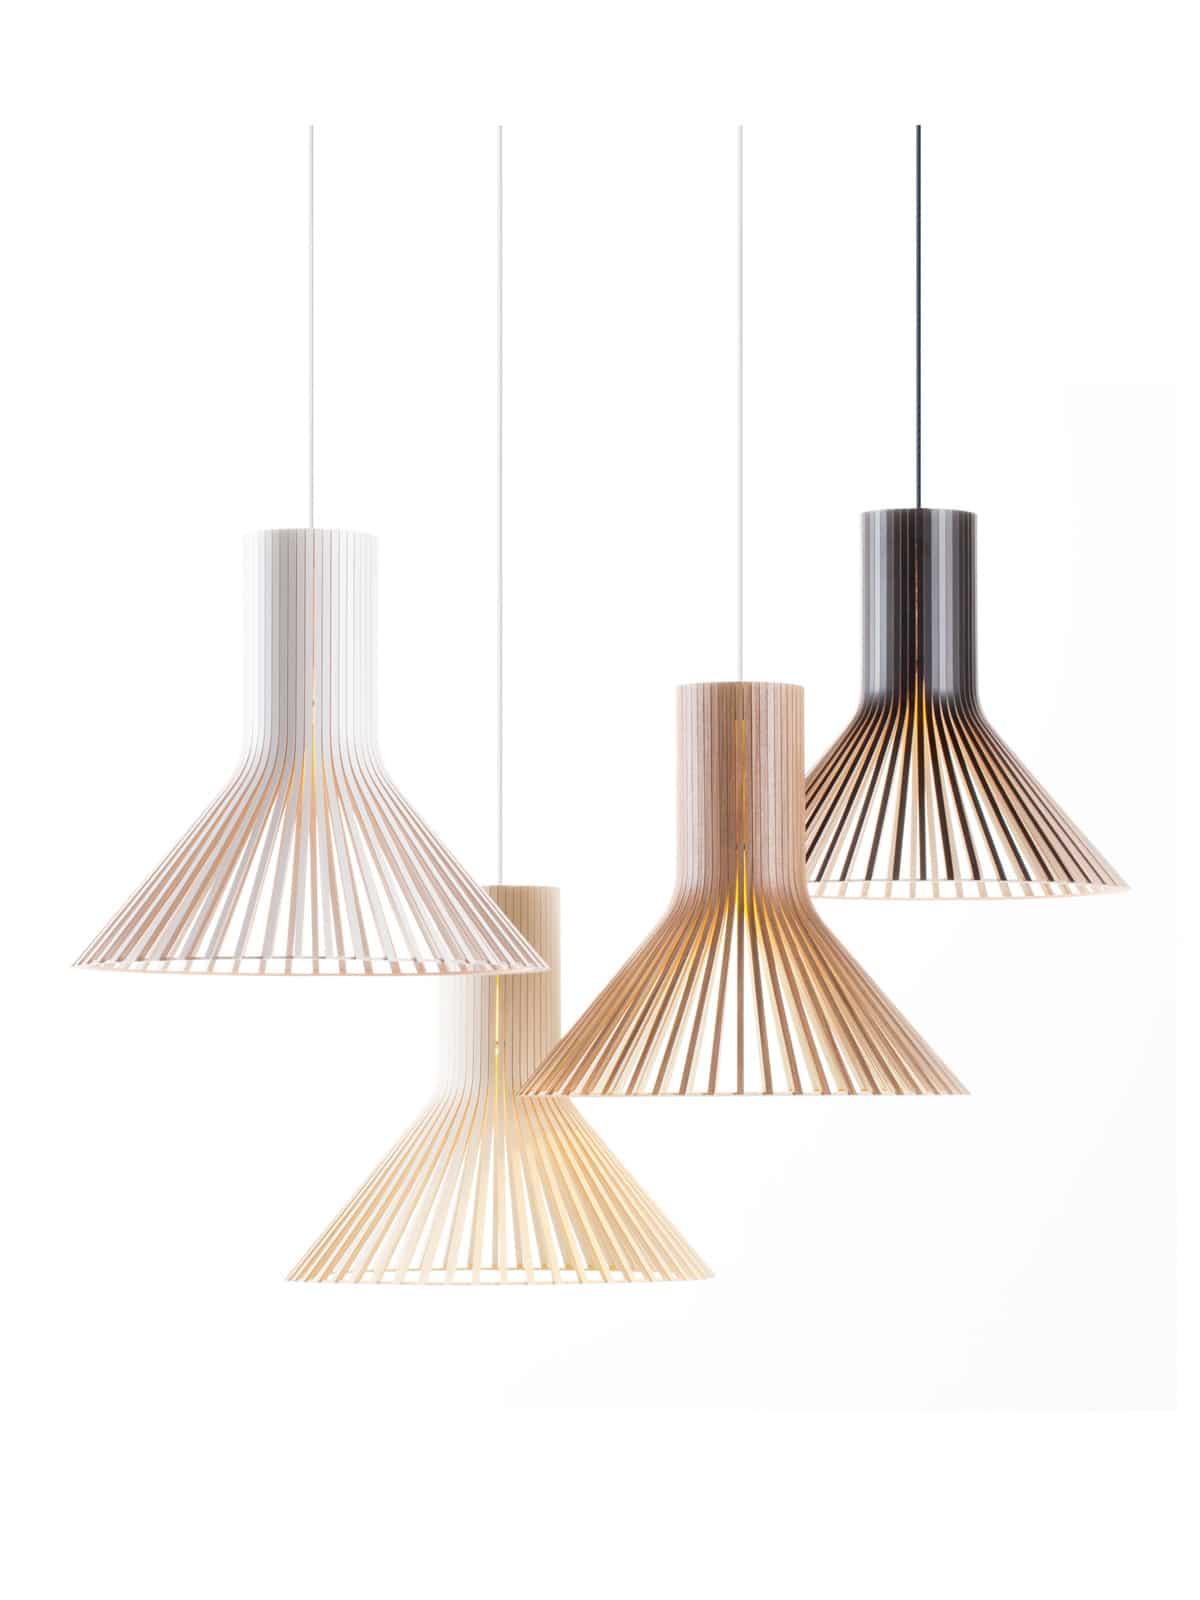 Secto Puncto 4230 Holzleuchte DesignOrt Lampen Onlineshop Berlin